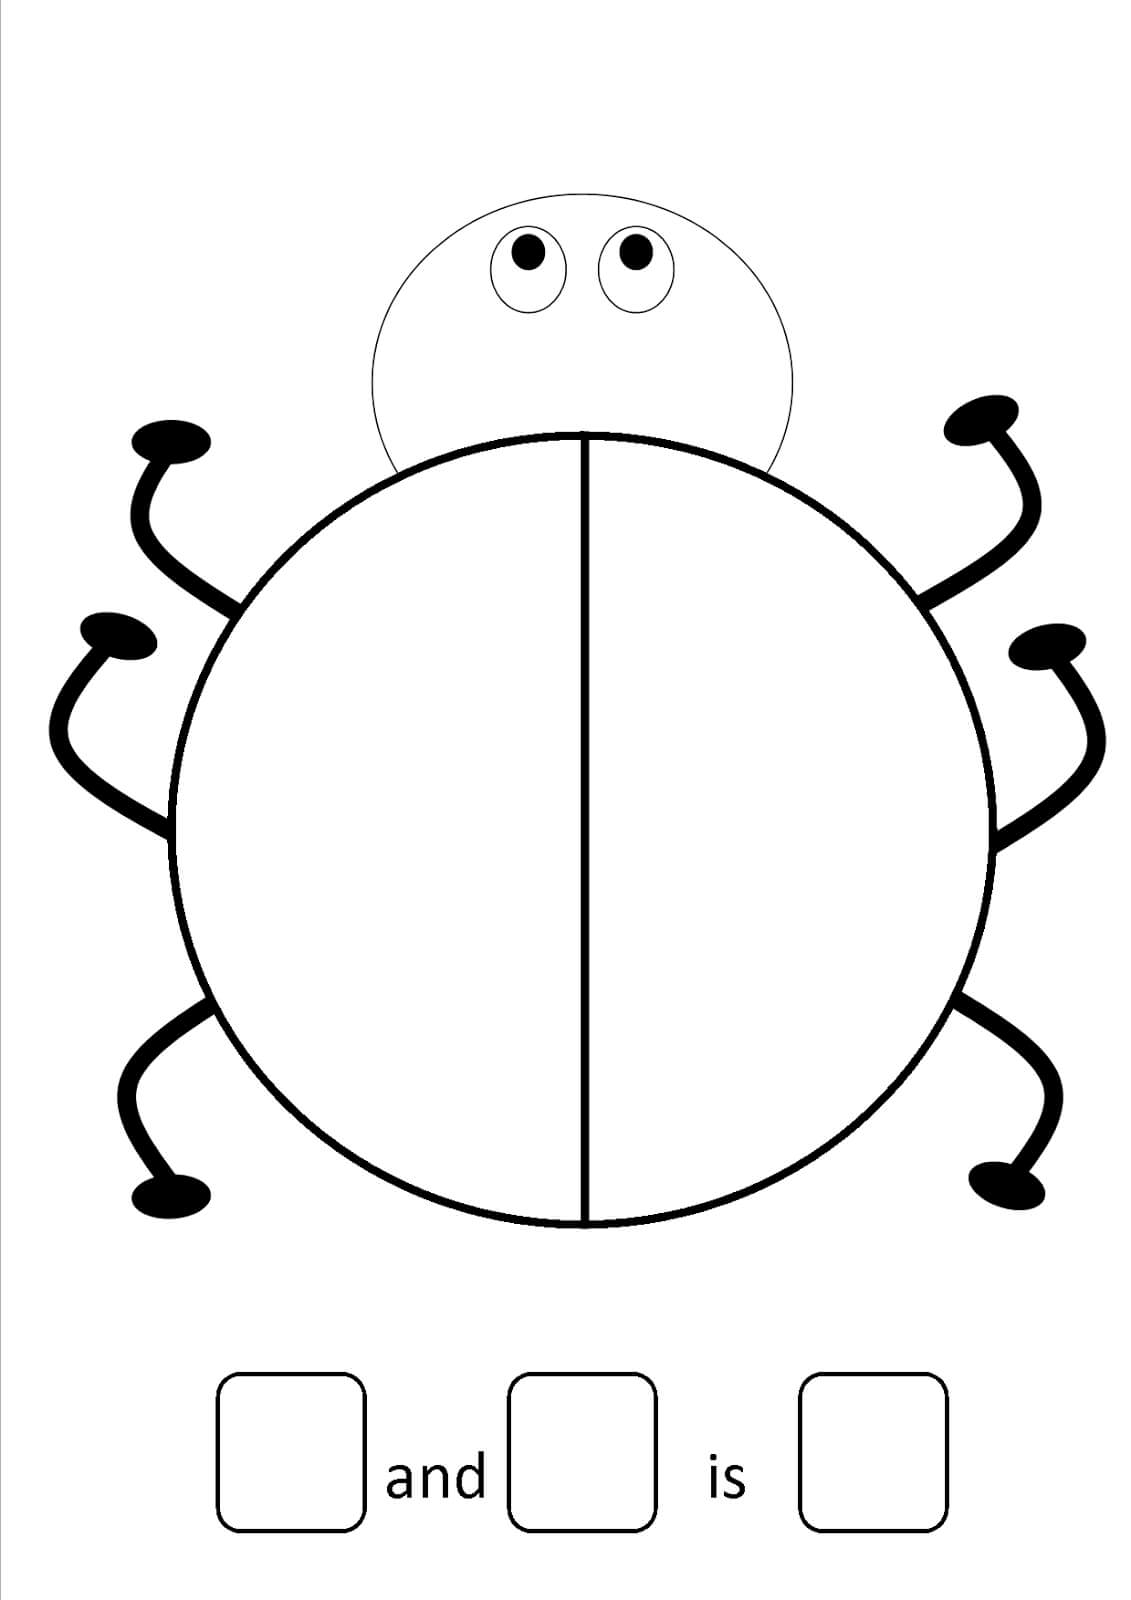 27 Images Of Large Ladybug Template Free | Zeept With Regard To Blank Ladybug Template